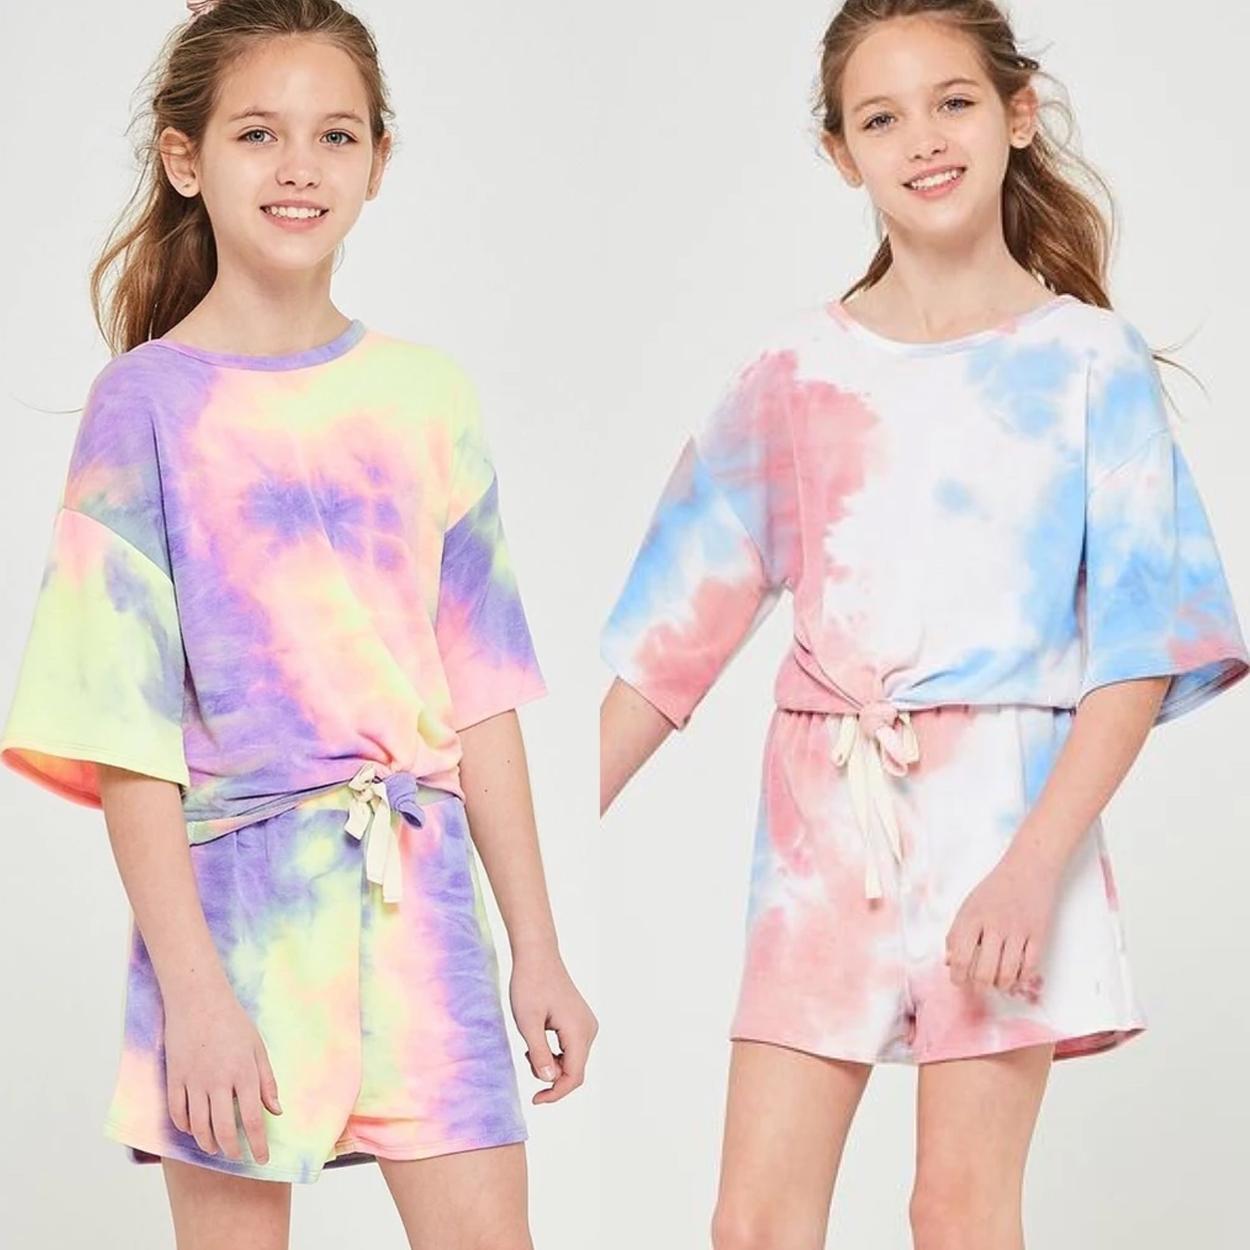 conjunto tie dye infantil tendencias